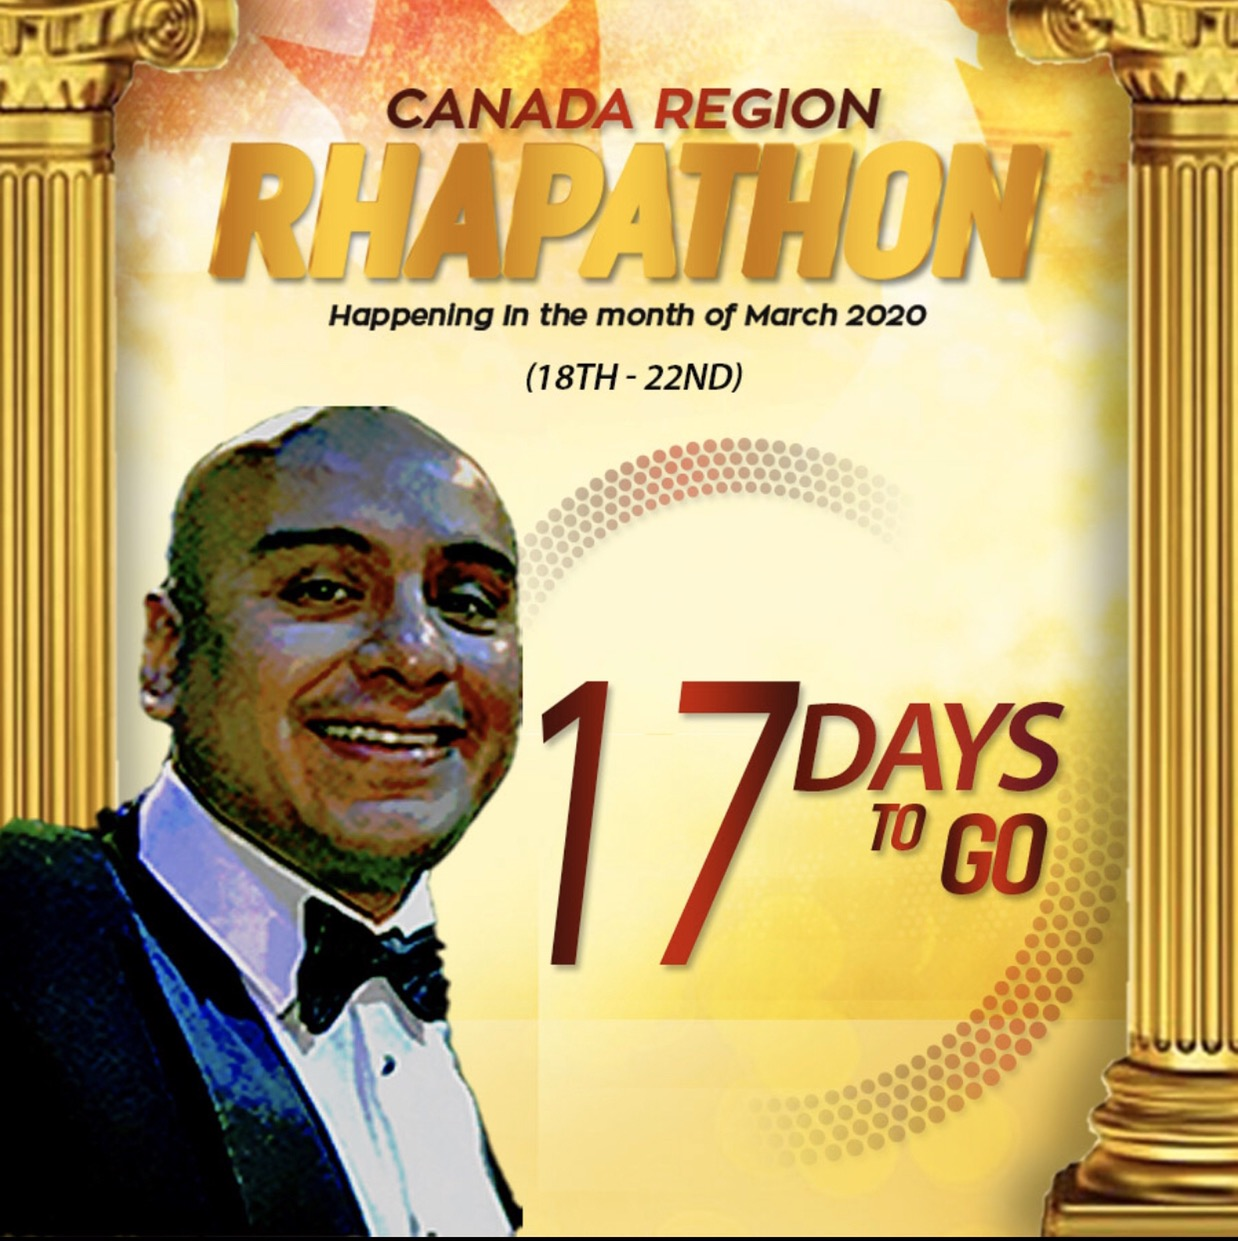 RAPHATON CANADA! 🇨🇦 🇨🇦 🇨🇦